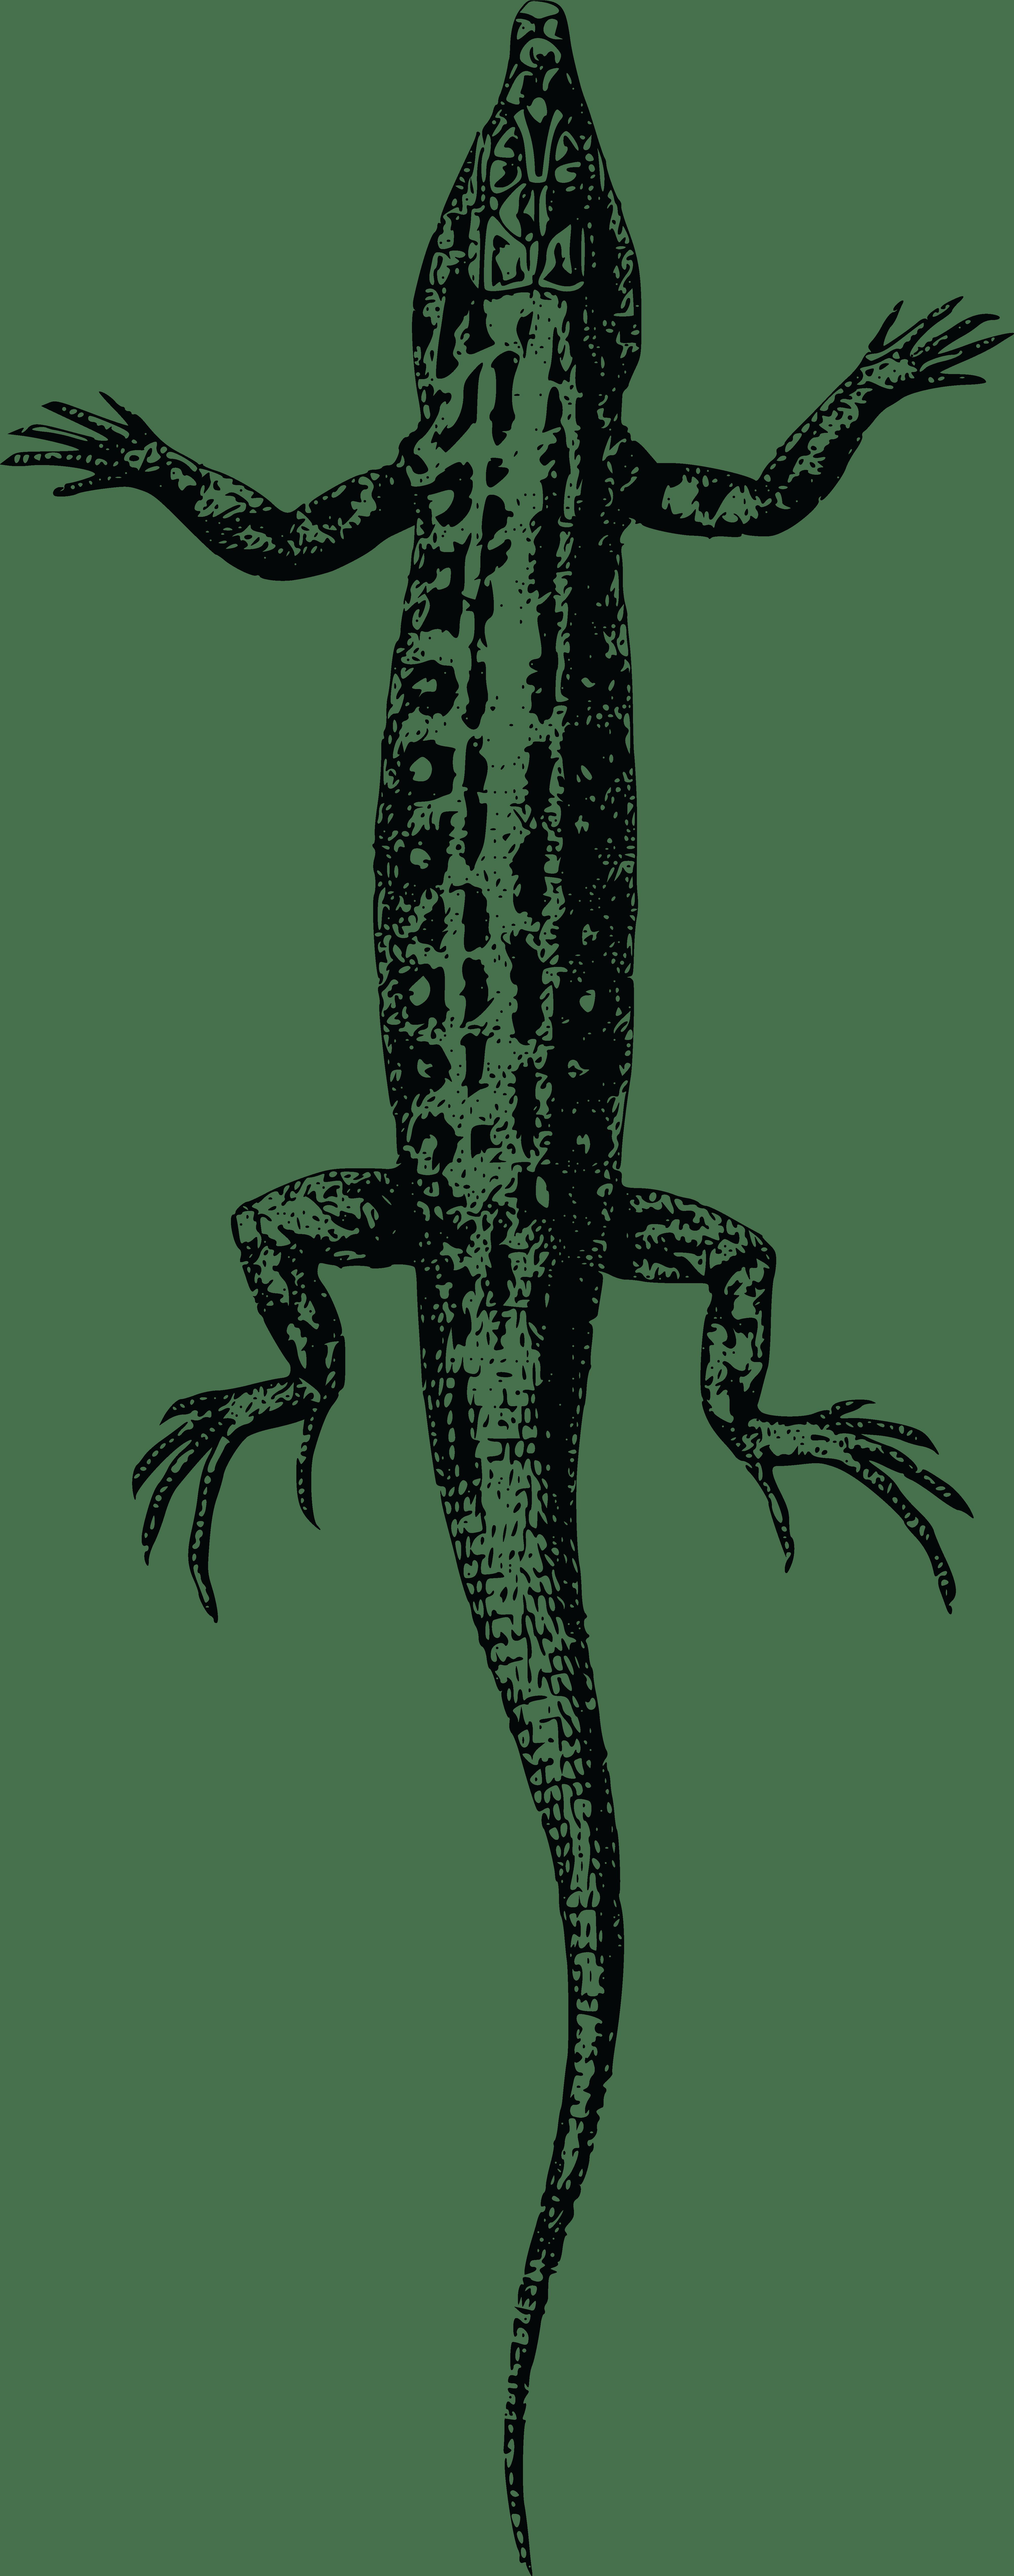 Free Clipart Of A Lizard